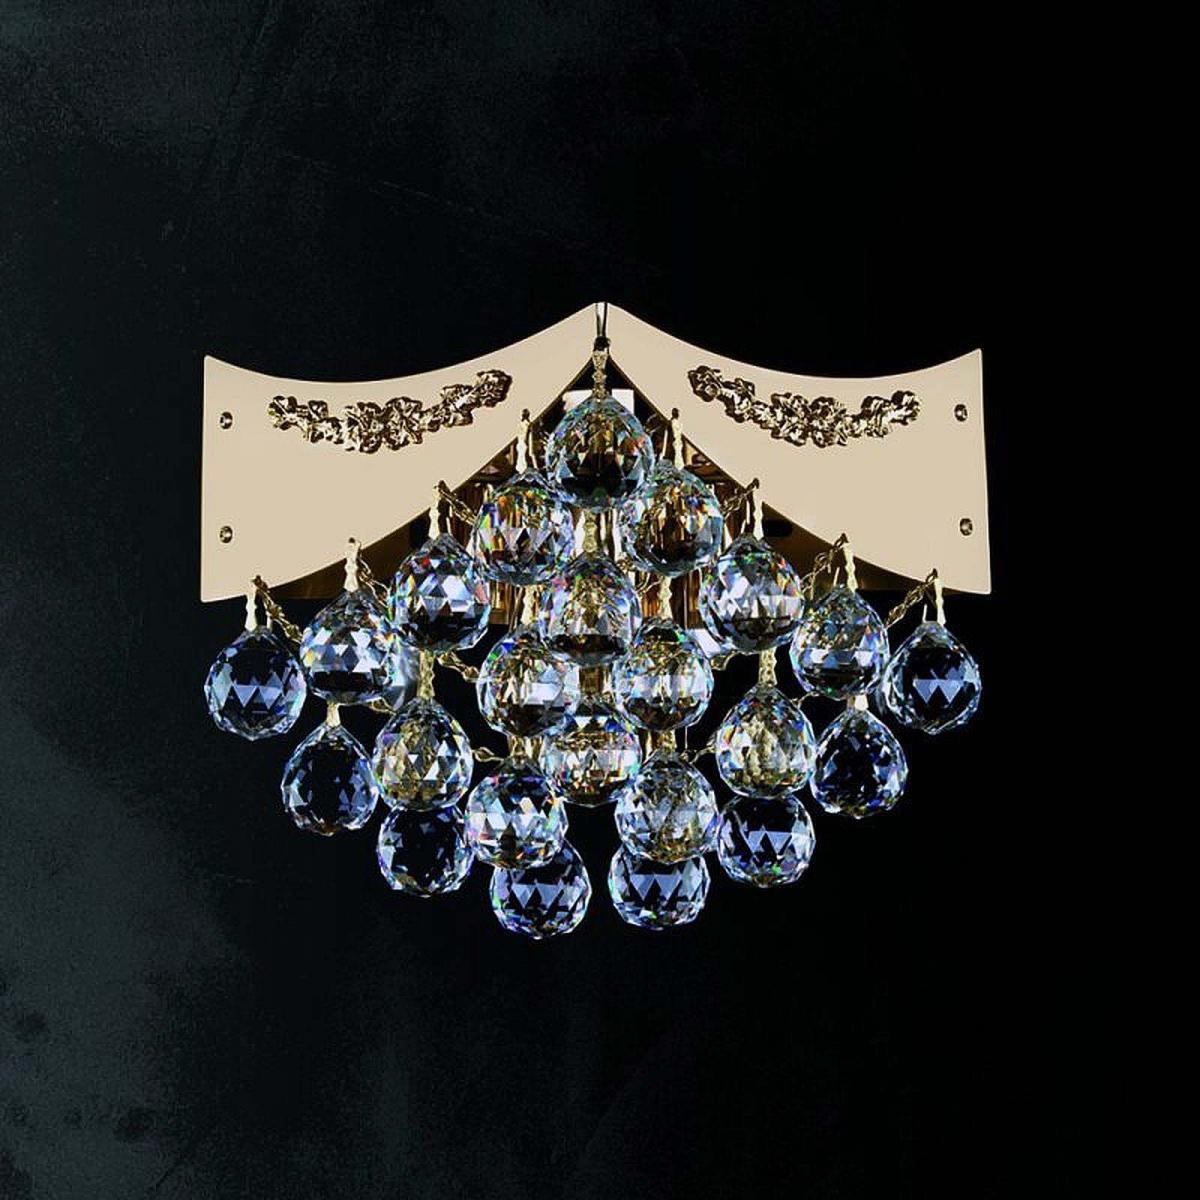 Crystal wall-mounted lighting fixture DAHLIA WL